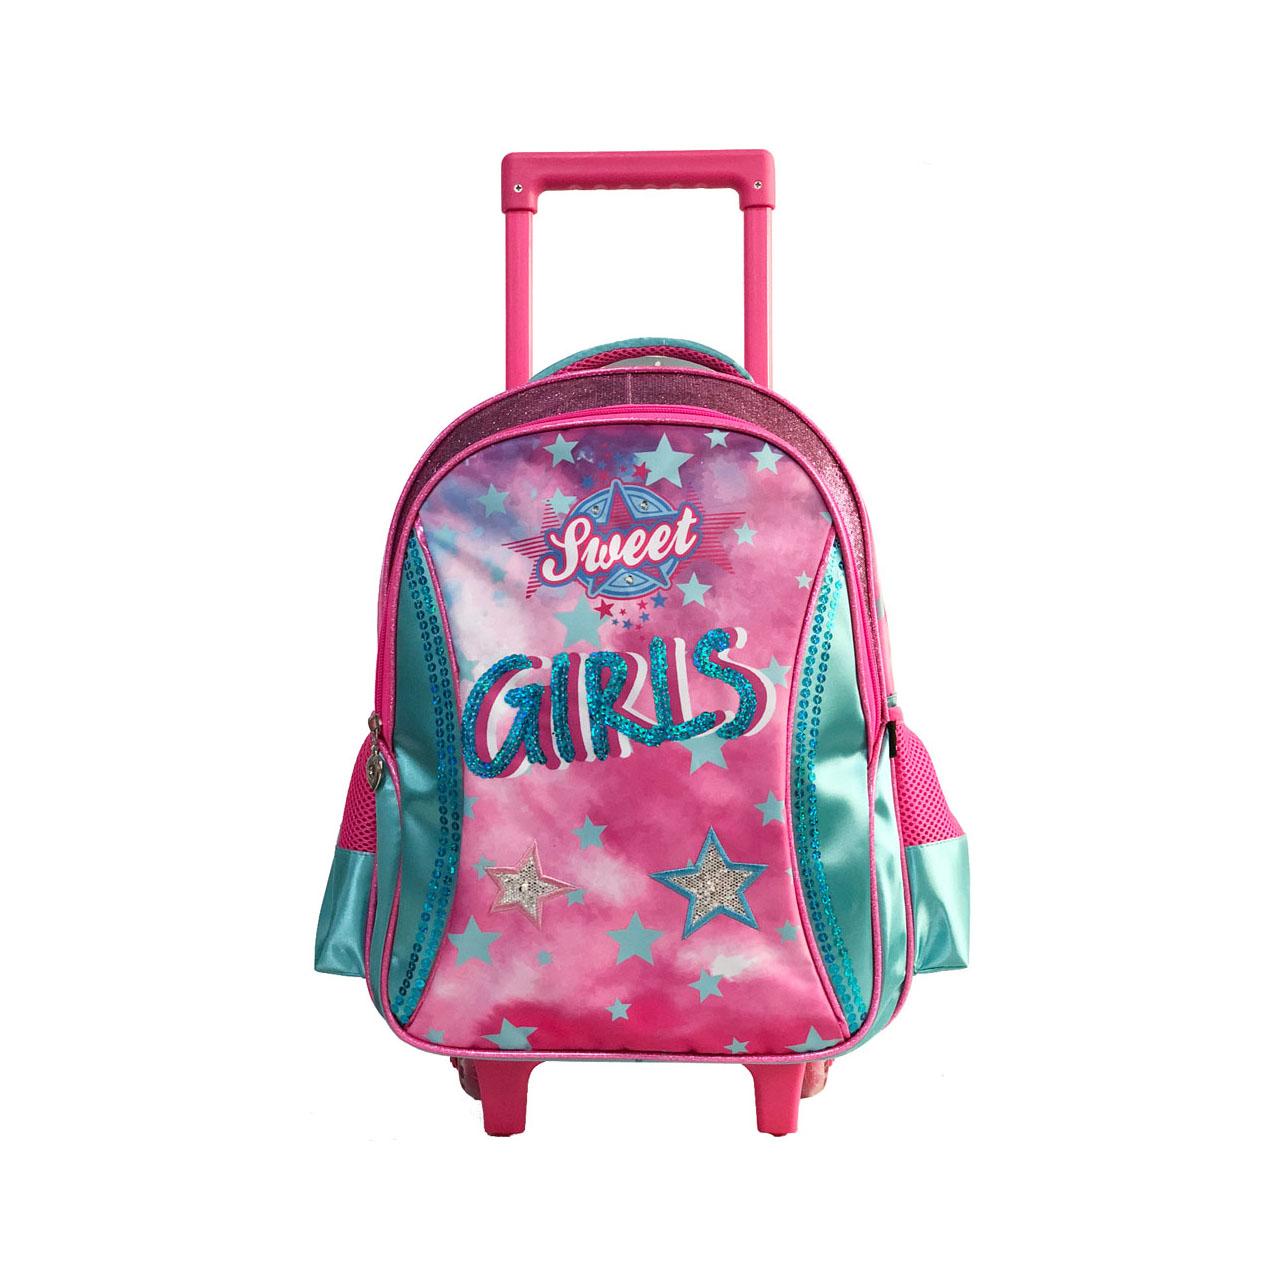 Mochila Infantil Starry Sky Poliéster Com Rodas Sweet Girl Rosa